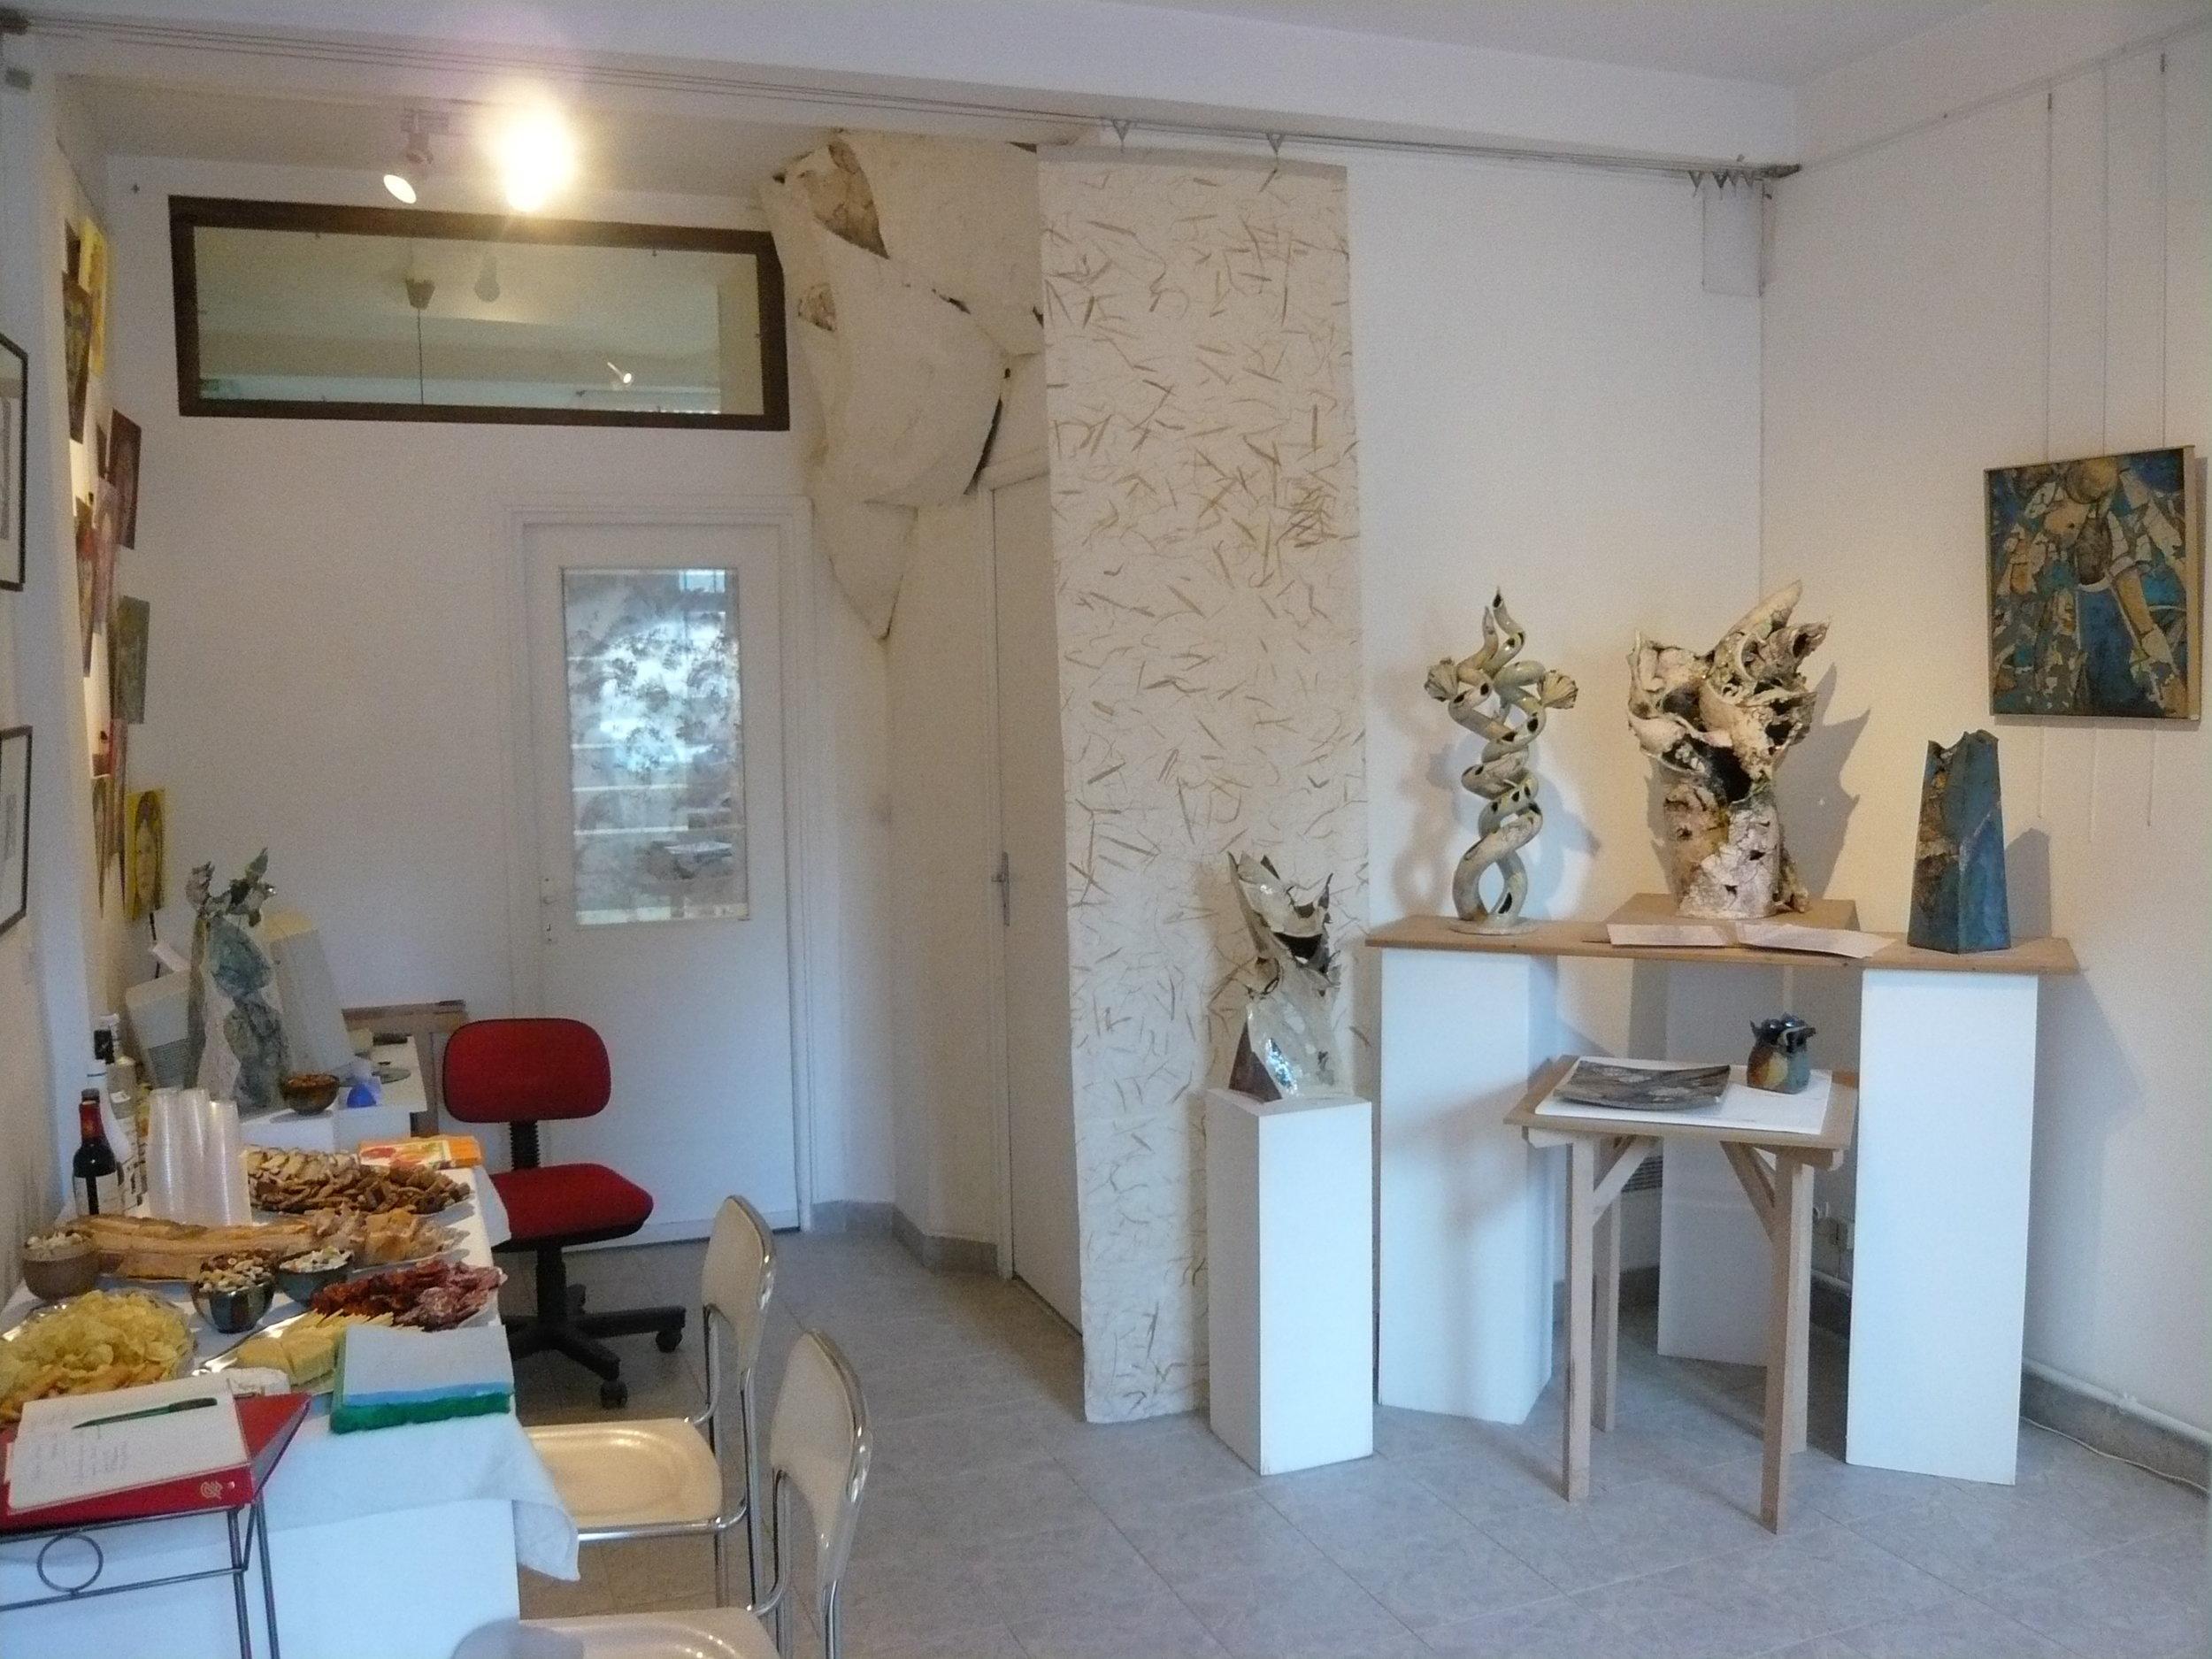 2 Artaim gallery space ok.JPG